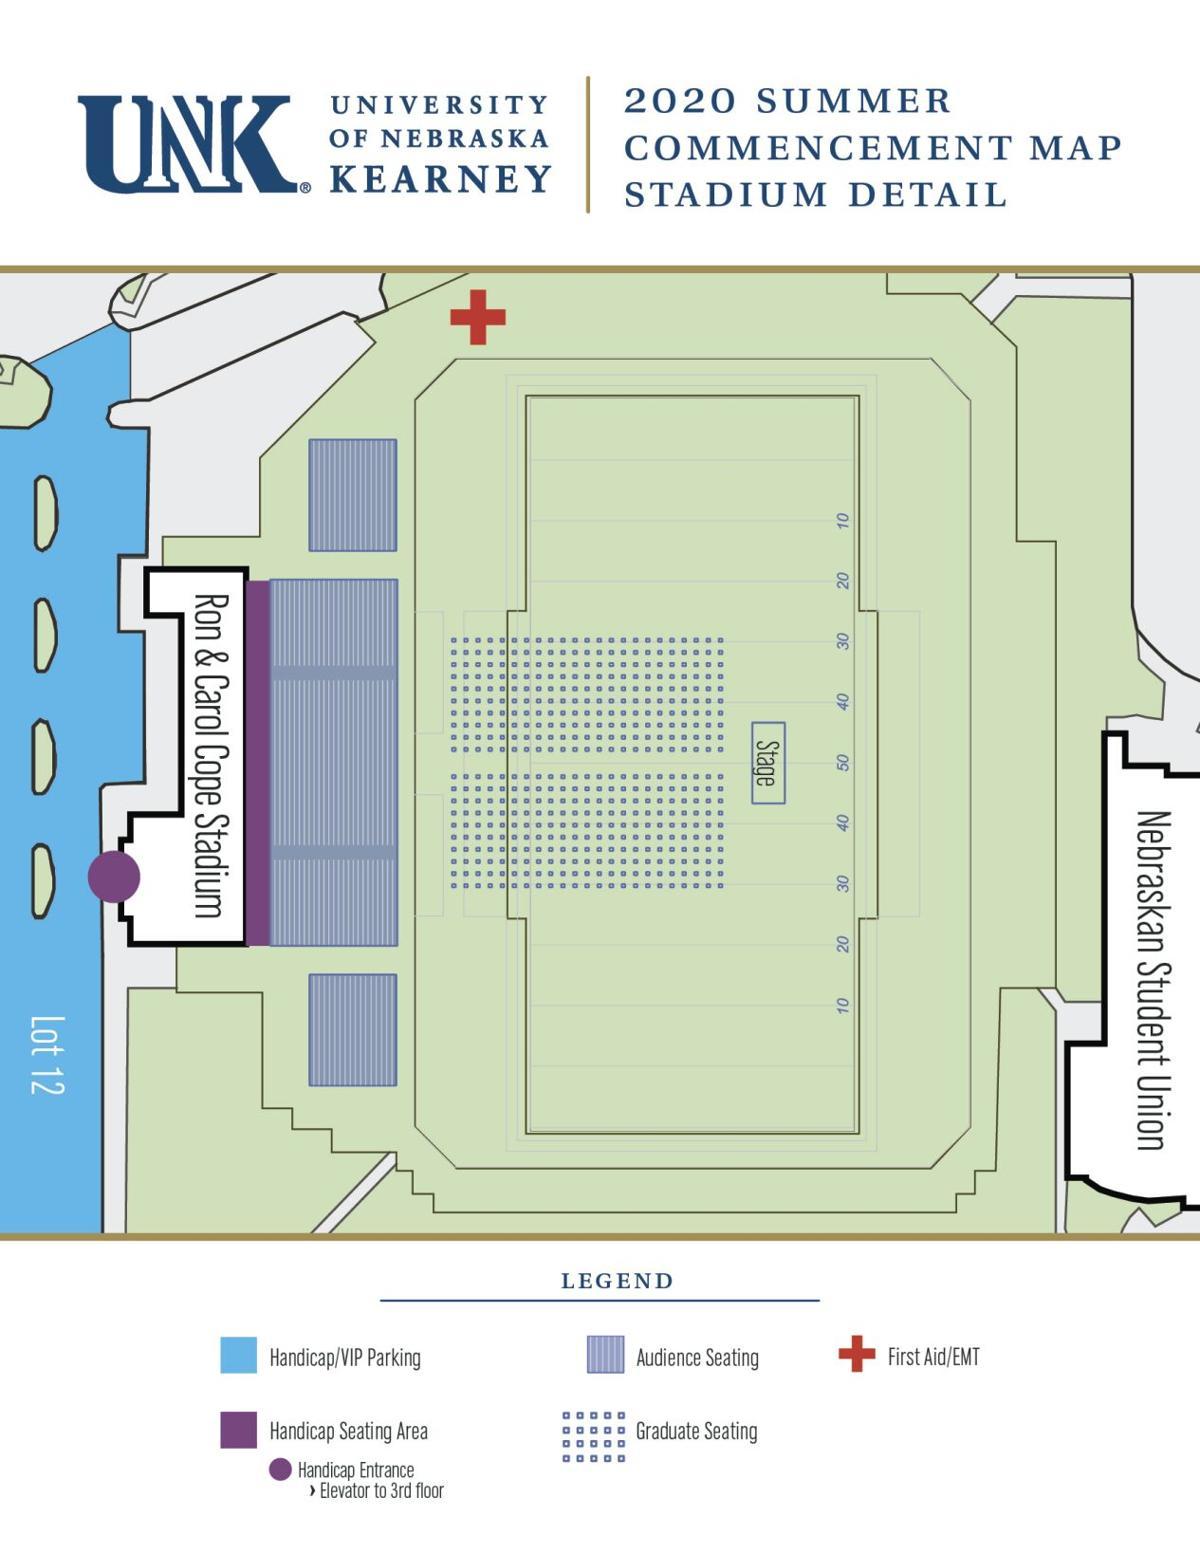 2020 Summer Commencement Map-Stadium Detail-1.jpg